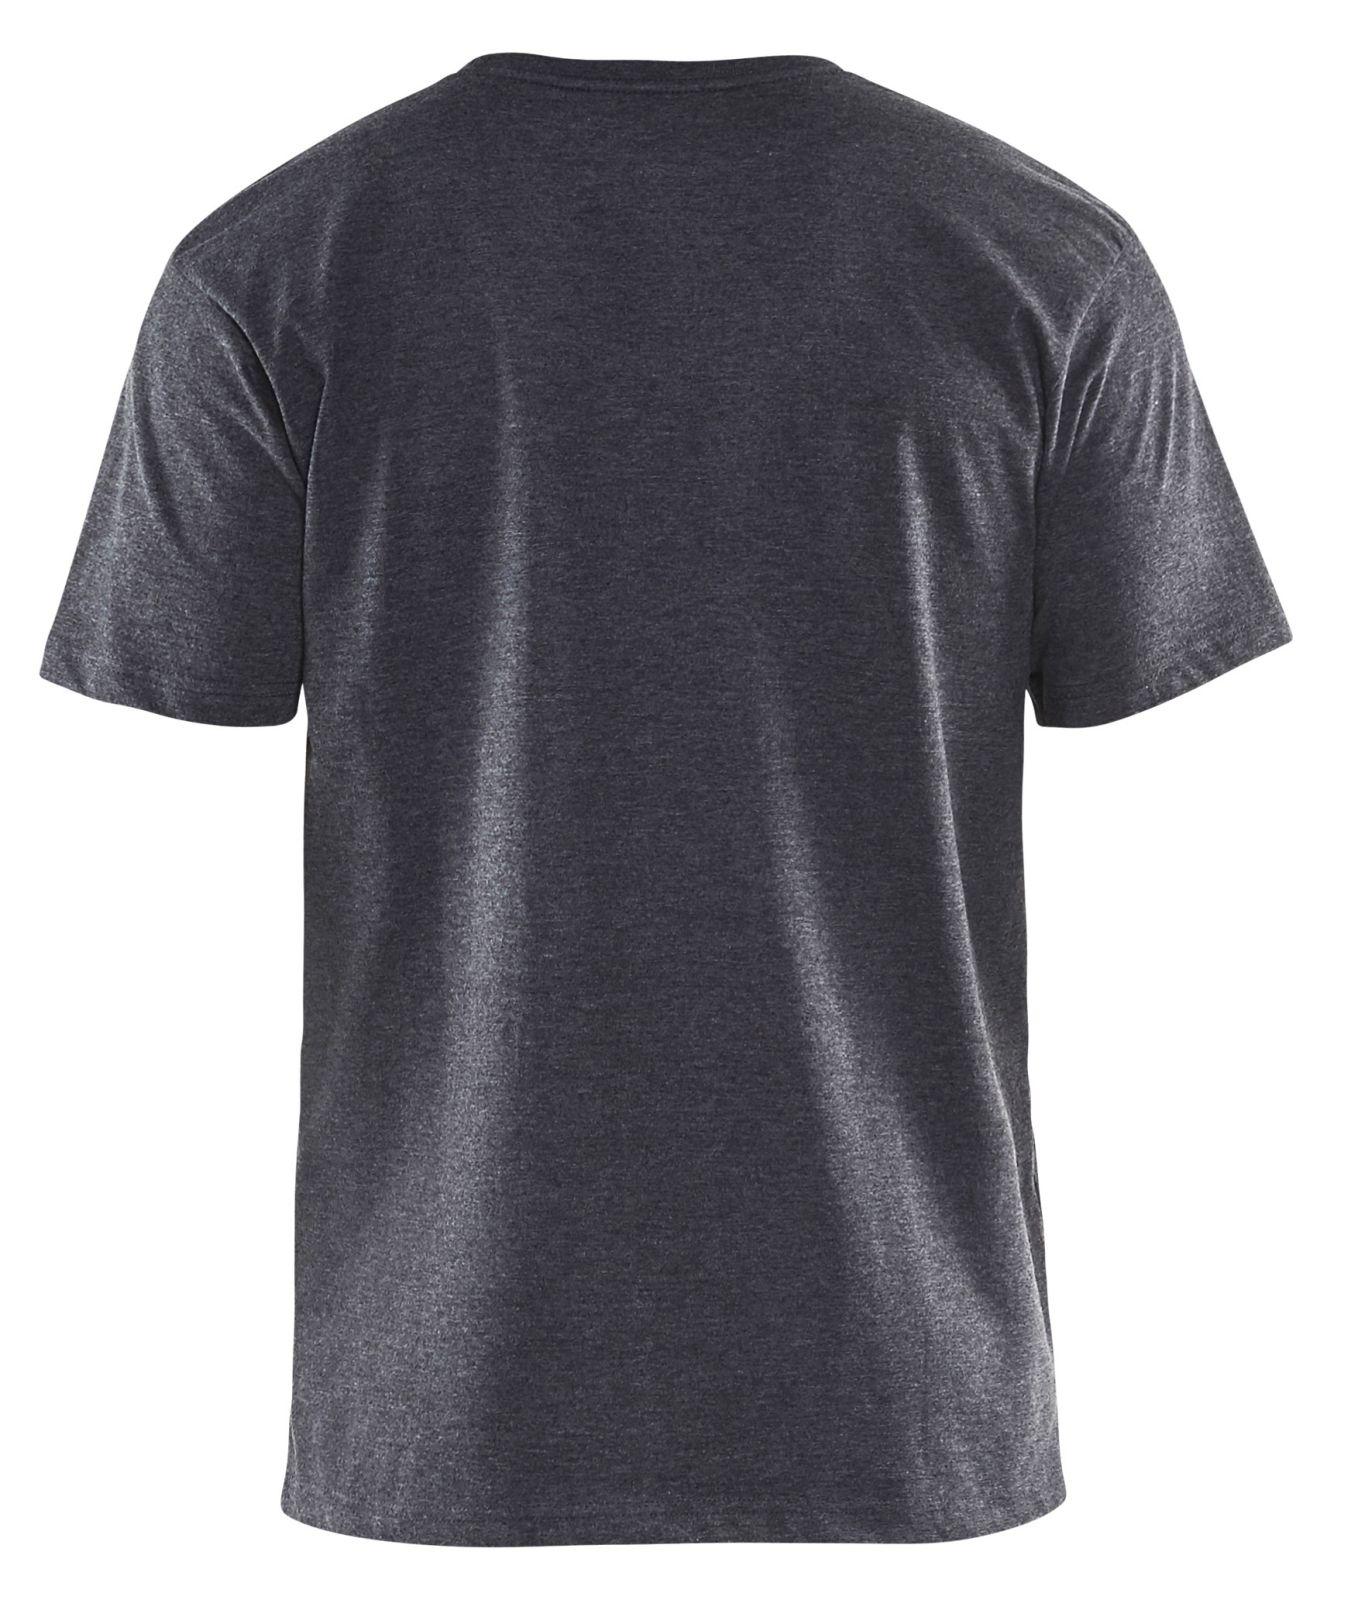 Blaklader T-shirts 35251053 zwart melee(9991)